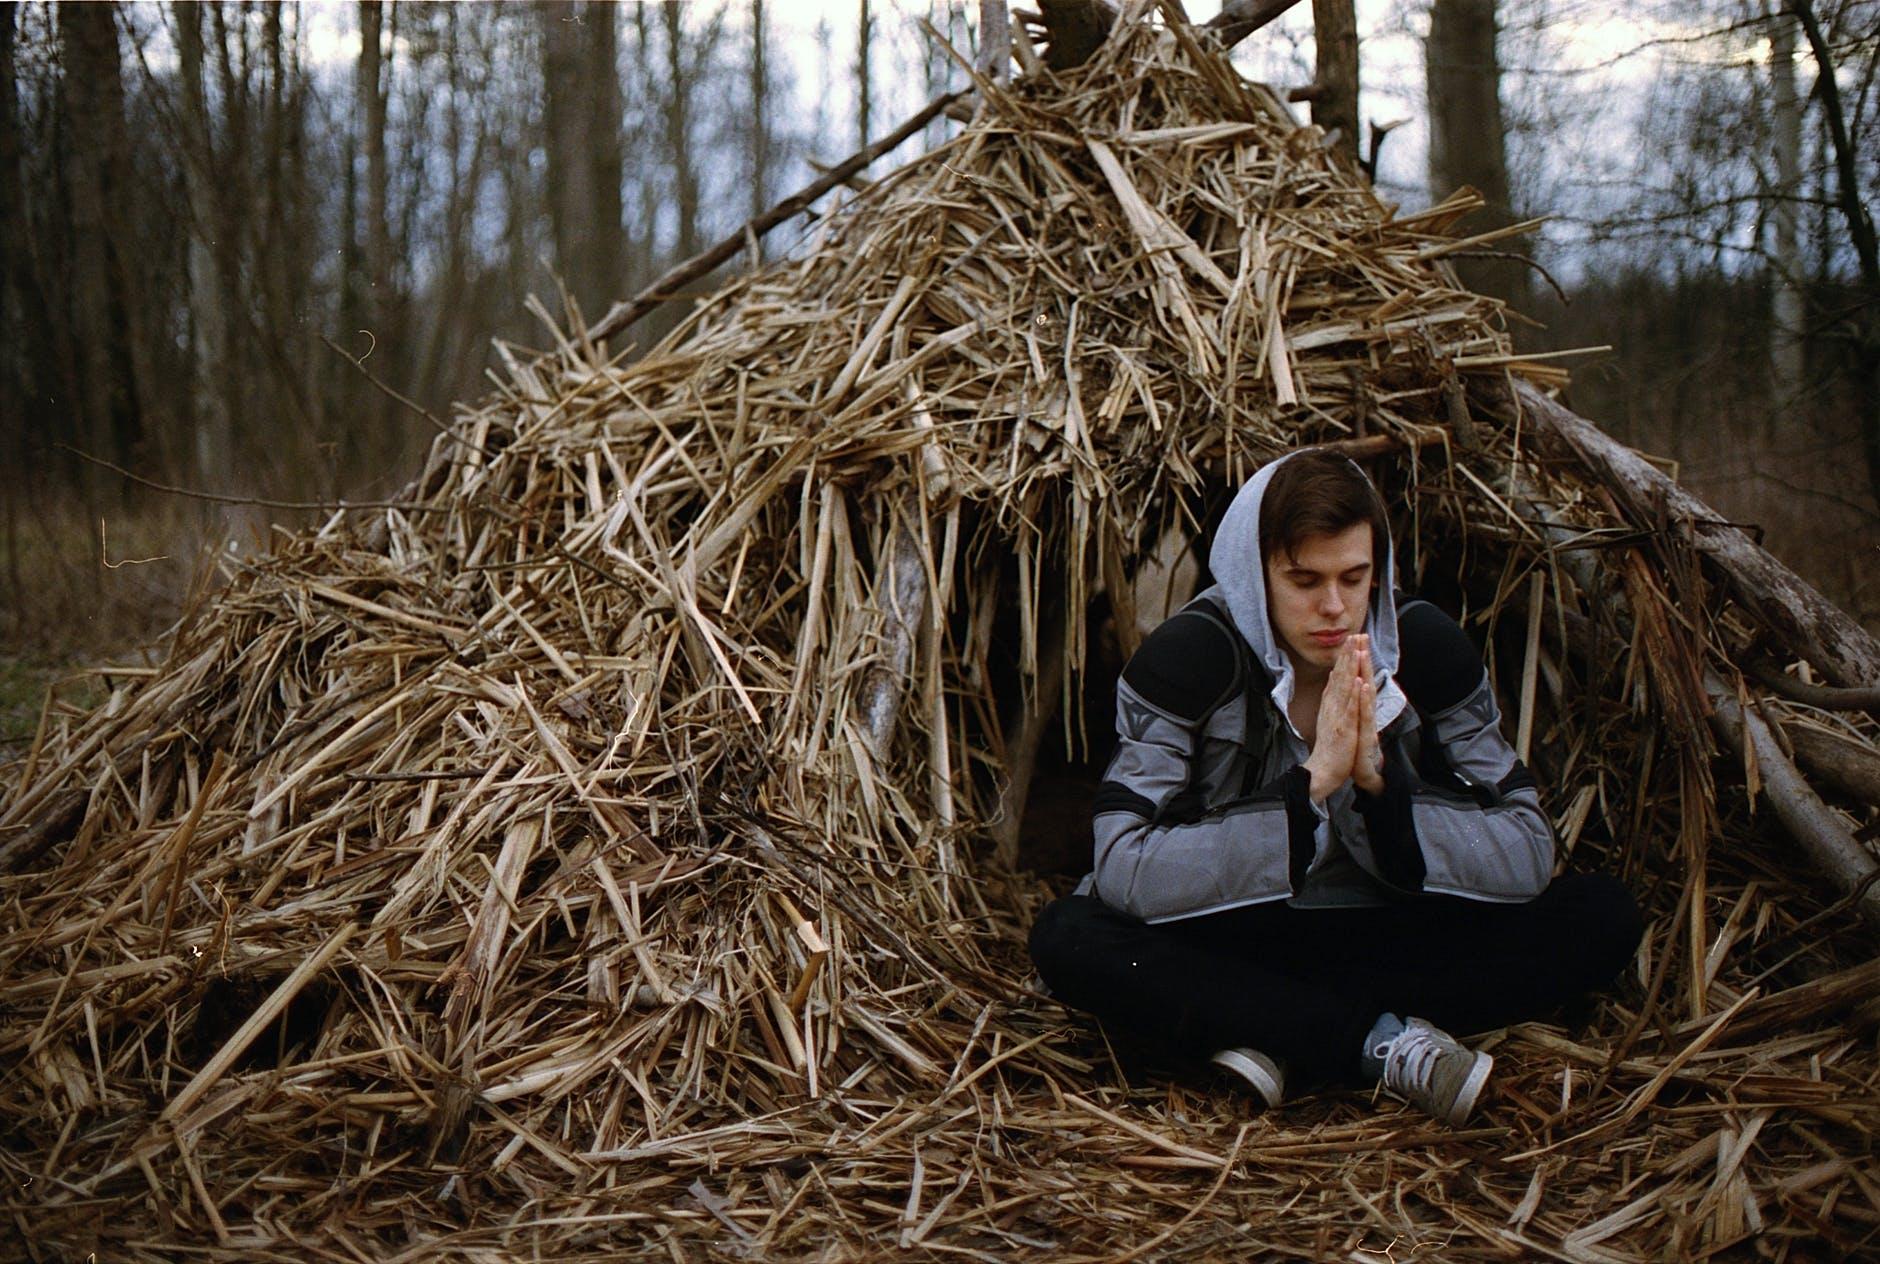 hay haystack meditate meditating